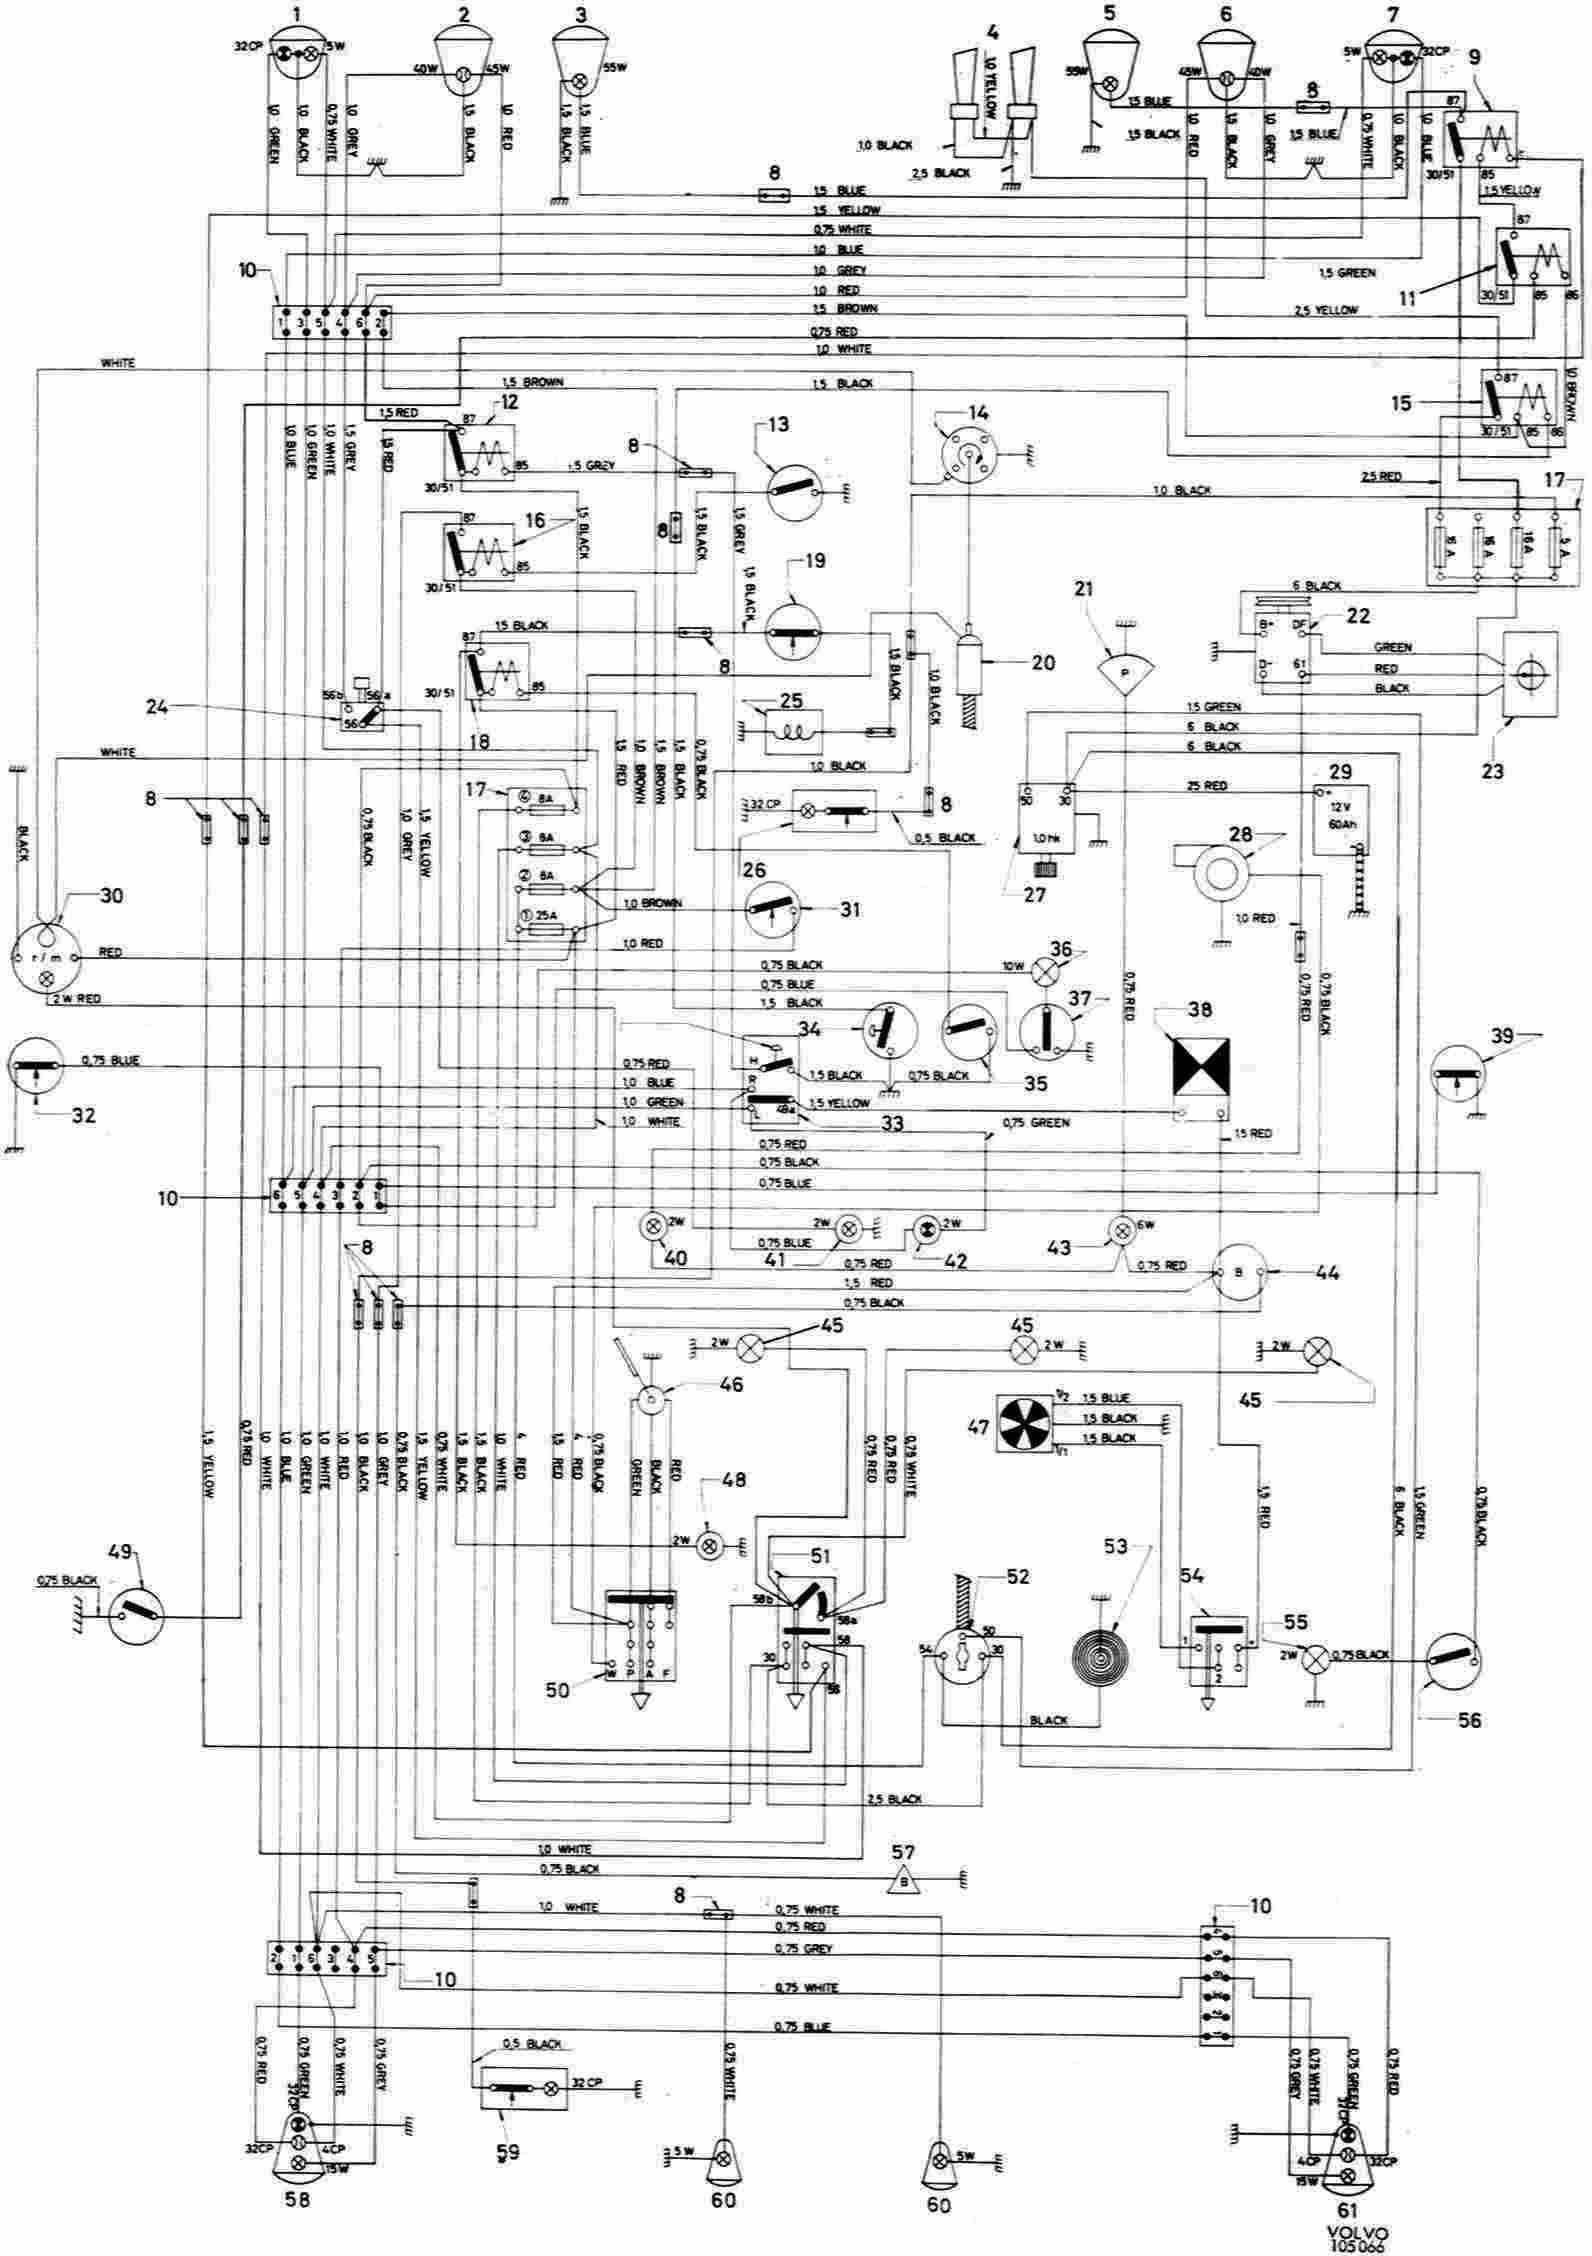 Volvo 660 Truck Wiring Diagrams